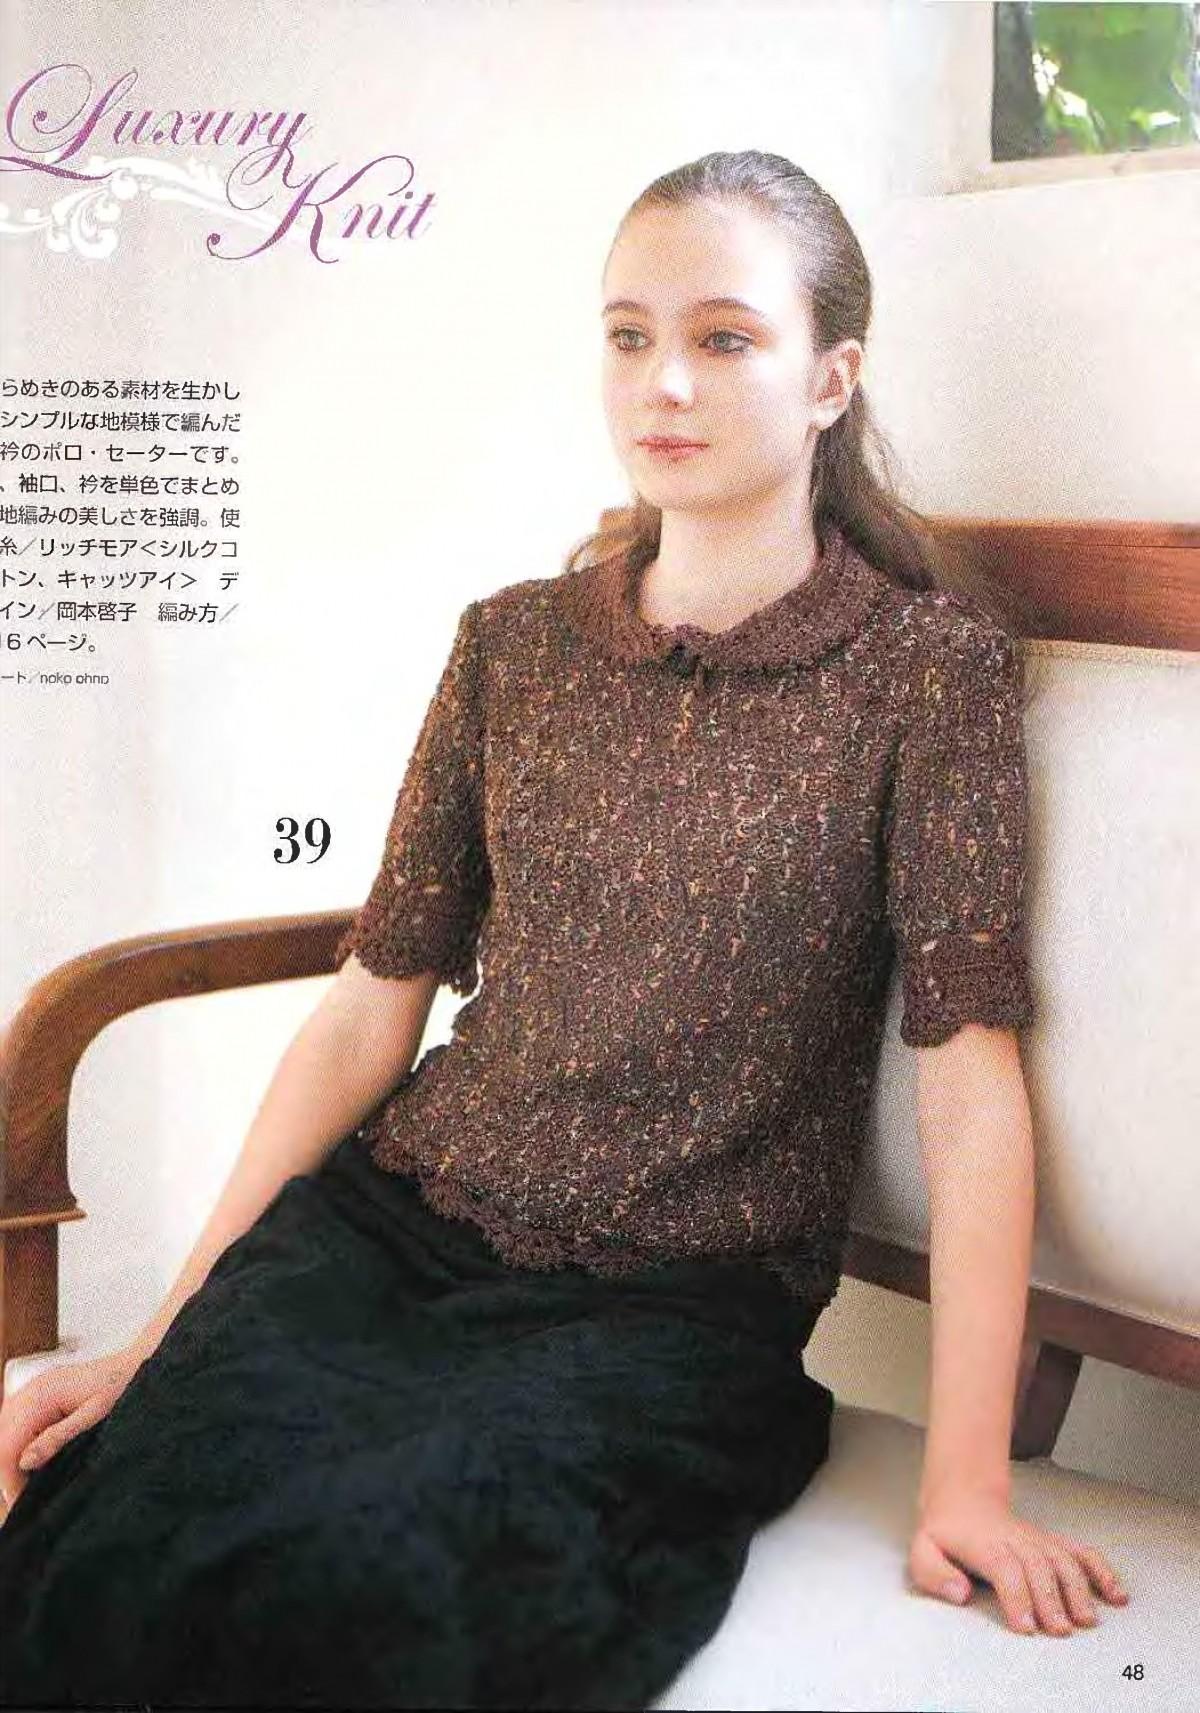 Lets-knit-series-NV4359-2008-Spring-Summer-sp-kr_46.jpg